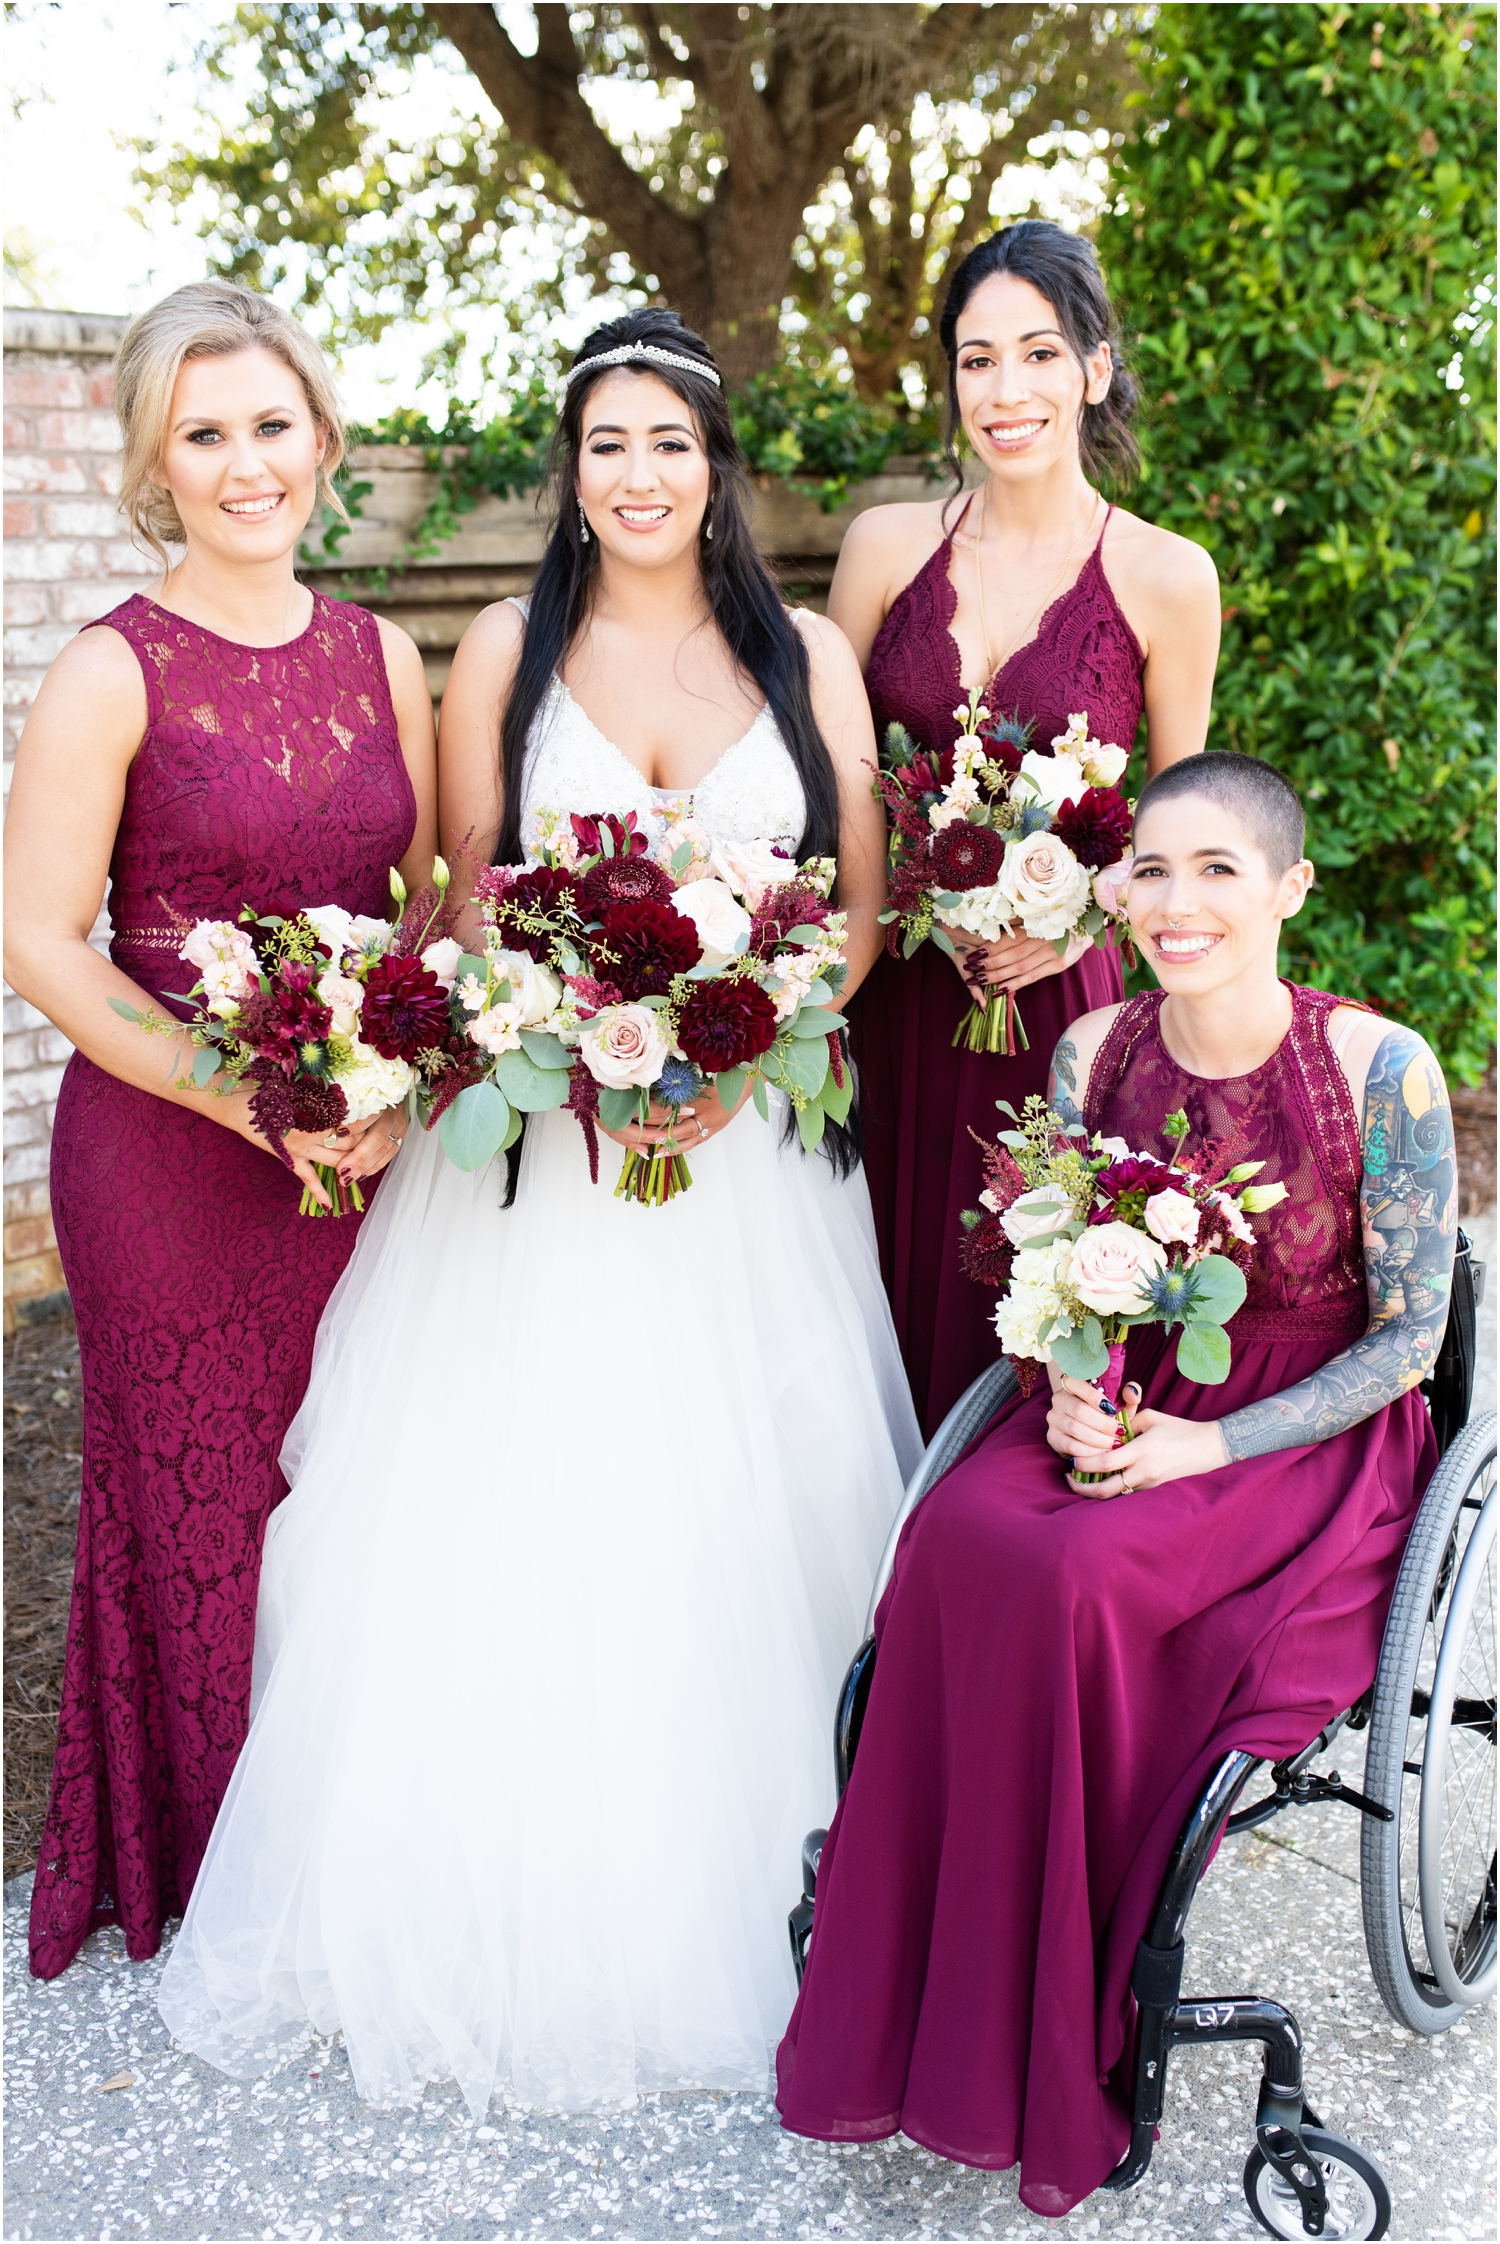 Henderson Beach Resort Inn Destin Florida Wedding Photographer Bride and bridesmaids